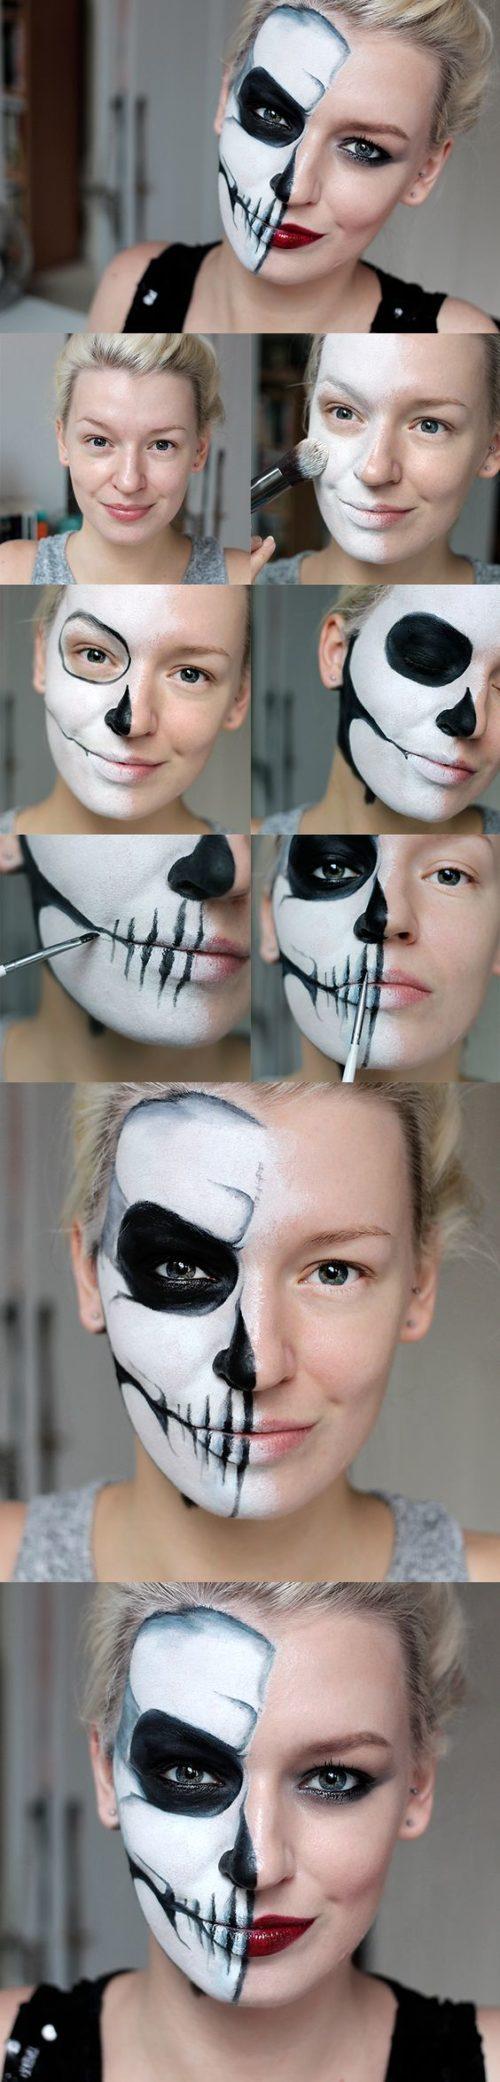 maquillajes-de-catrinas-10